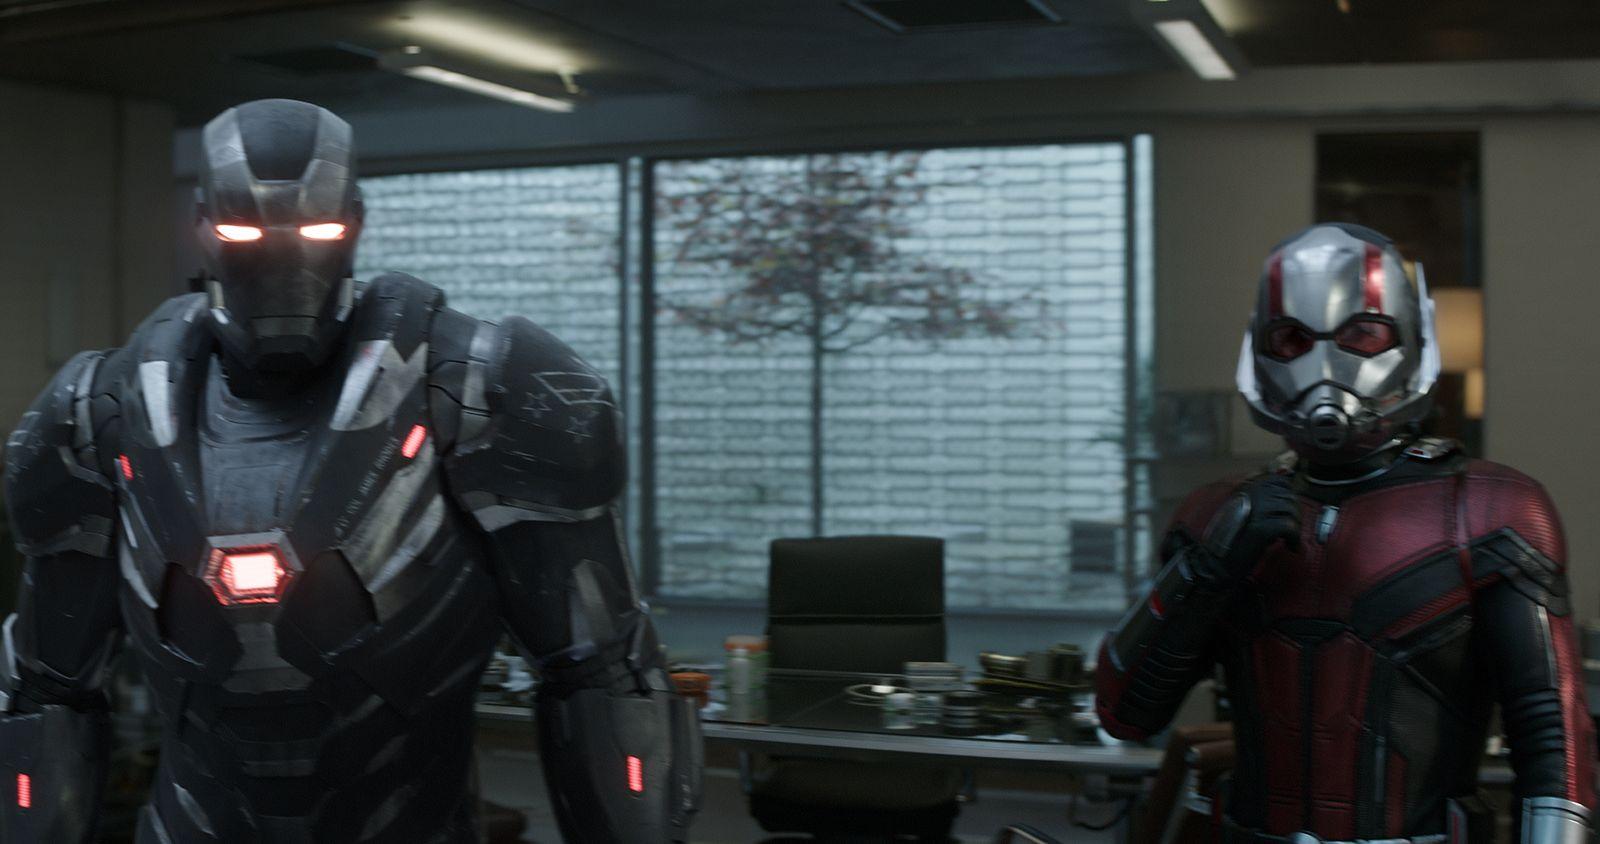 EINMALIGE VERWENDUNG Film / Avengers / Endgame / War Machine / Ant-Man / Marvel Studios